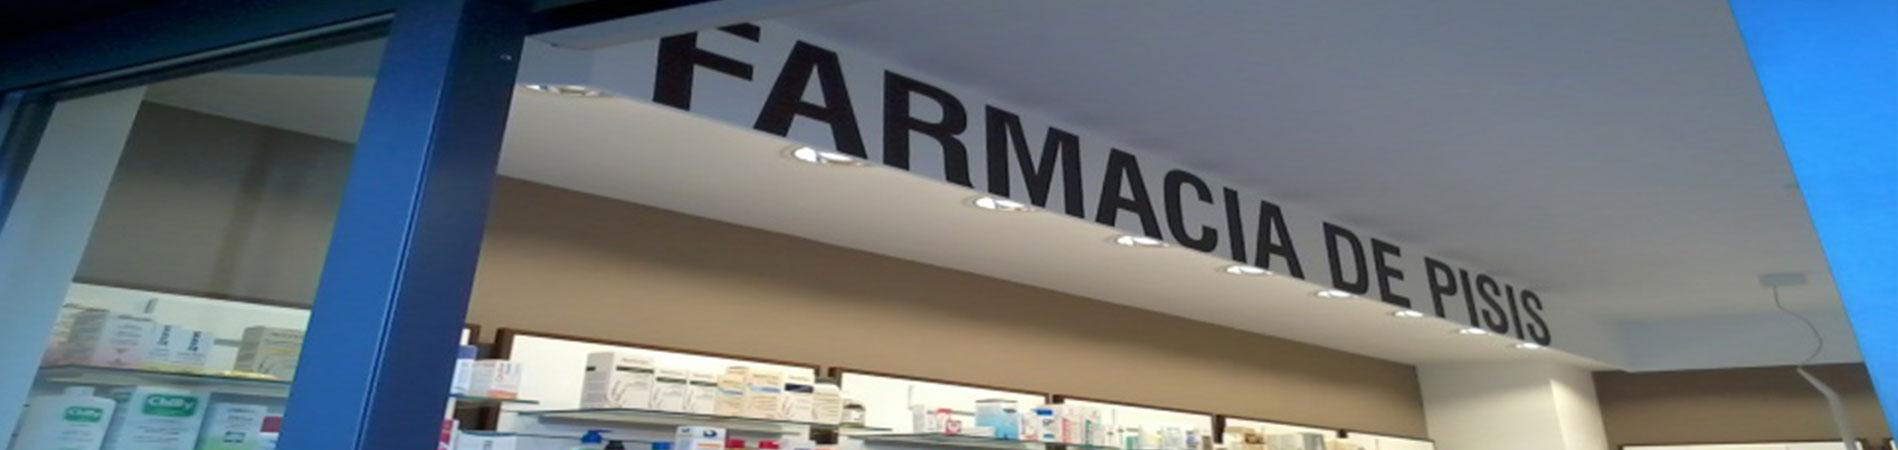 Benvenuti in Farmacia De Pisis